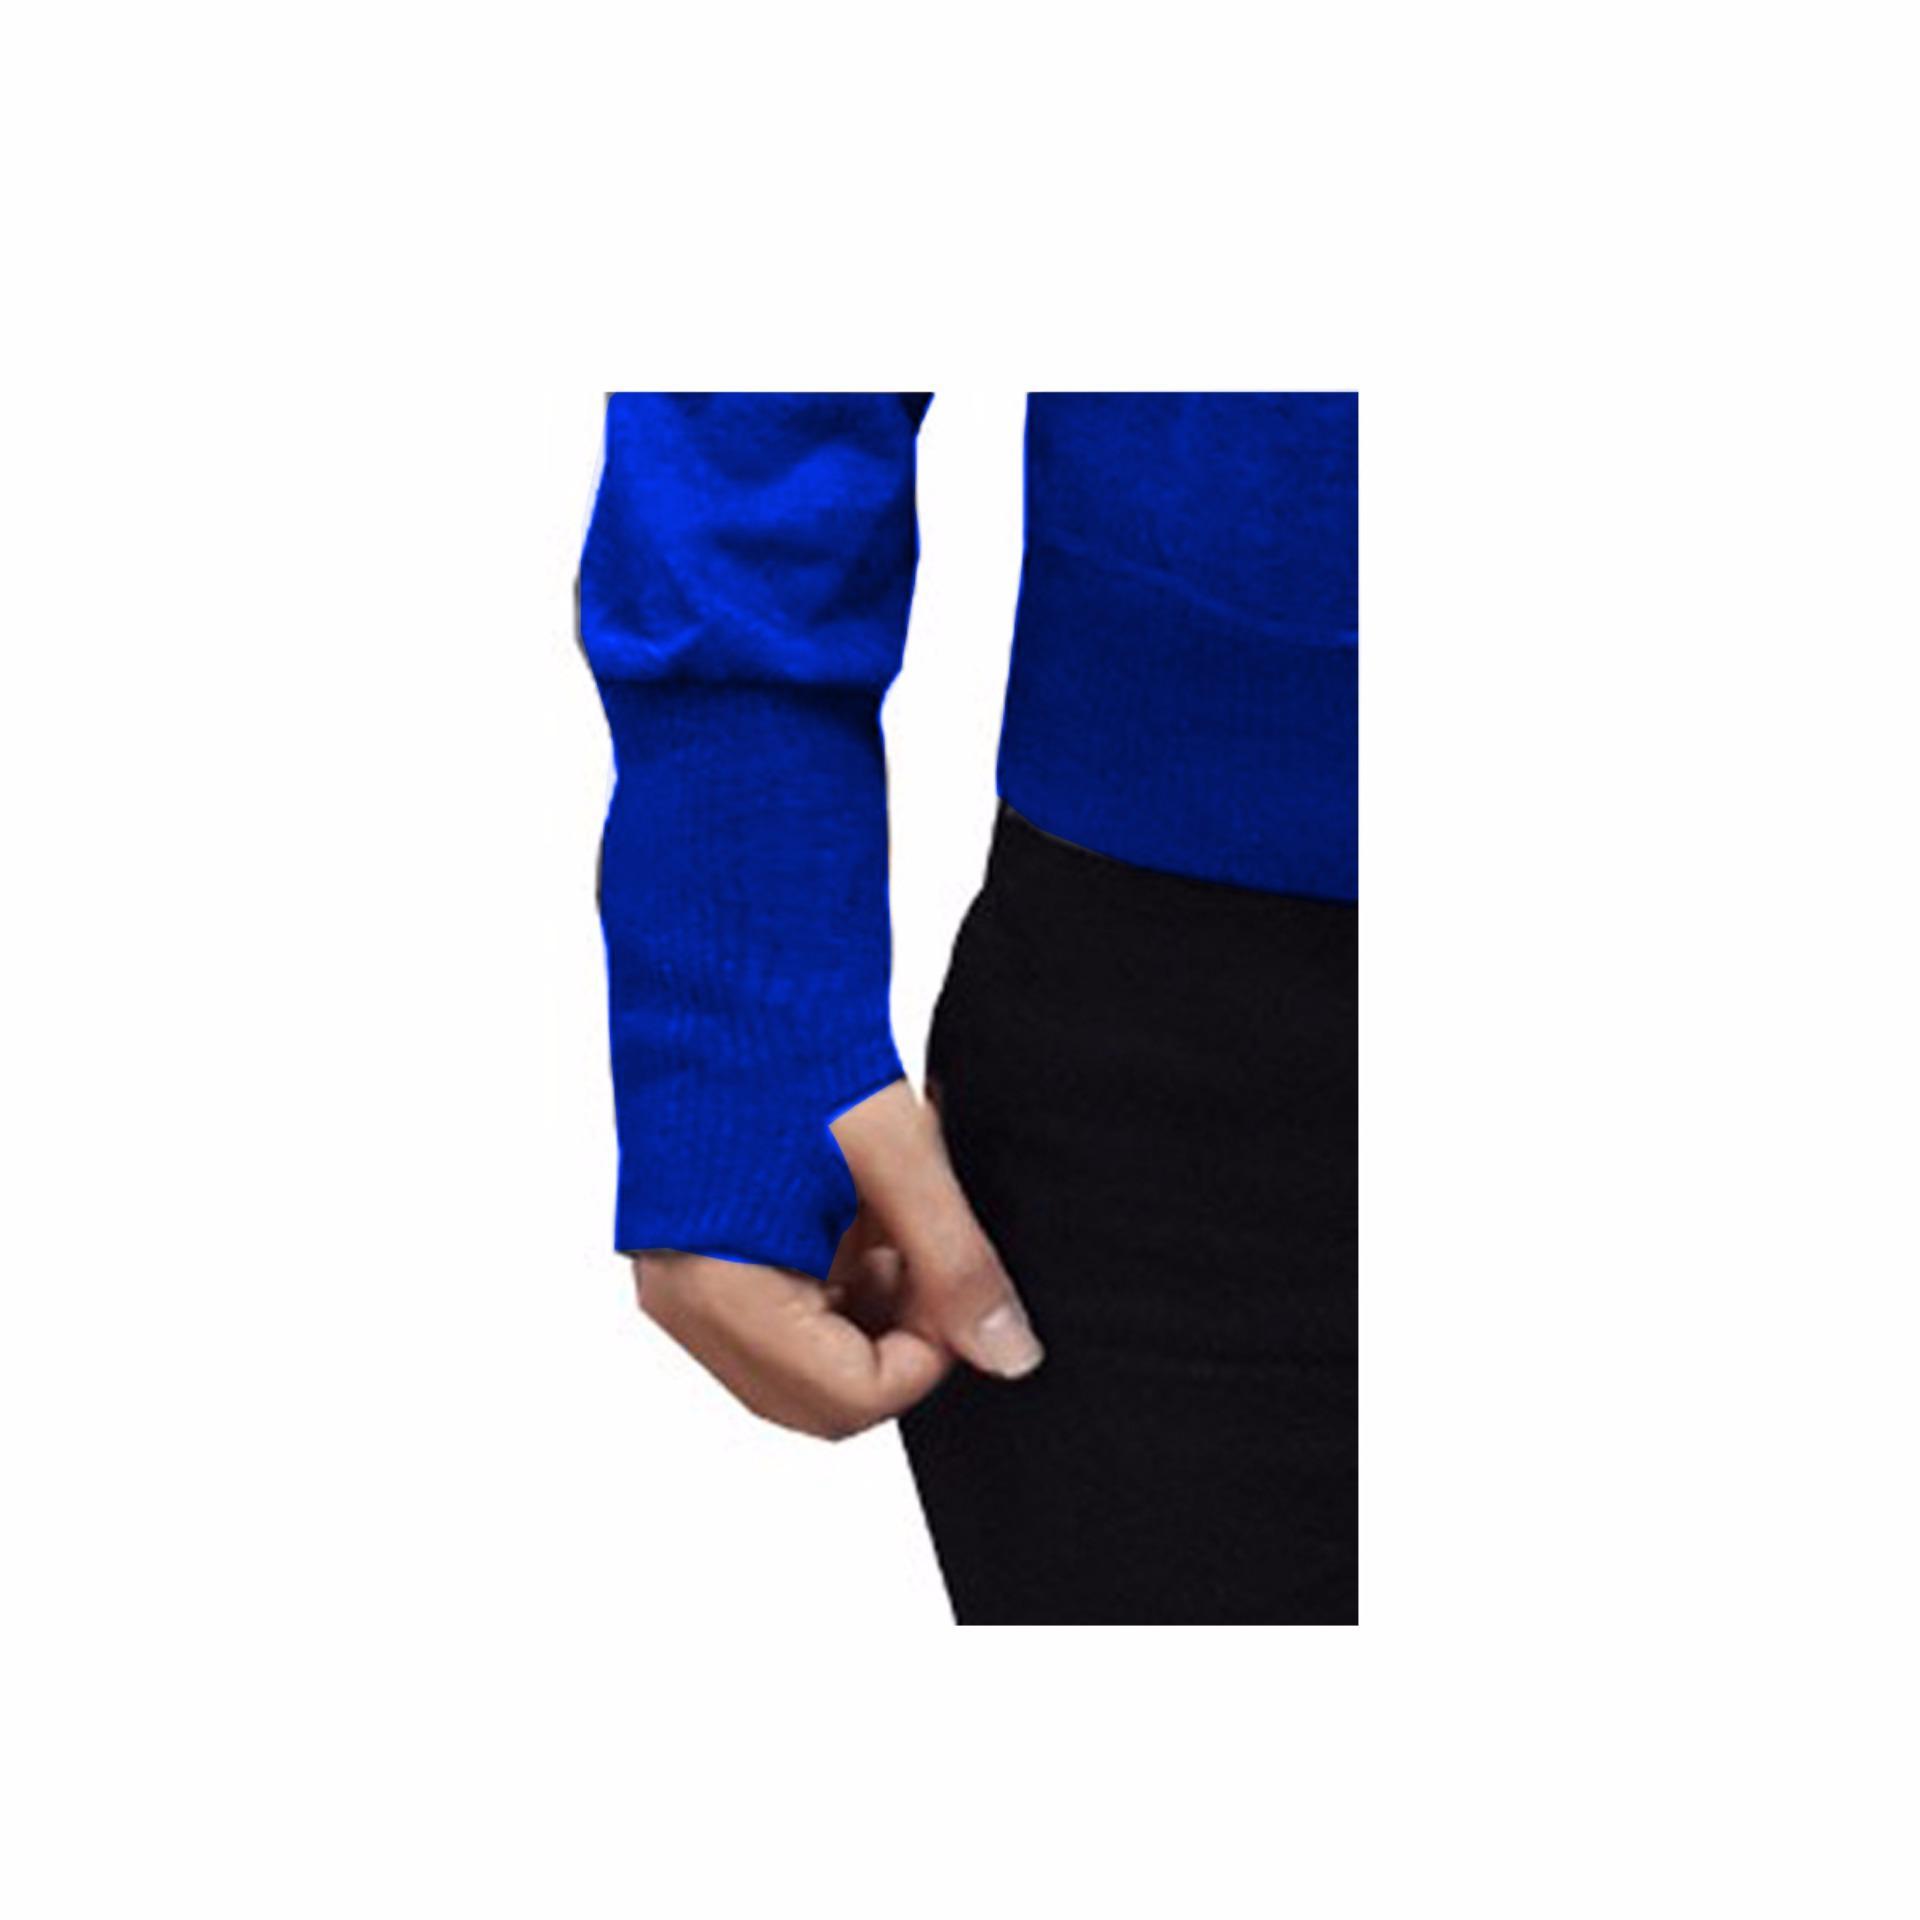 Terbaik Murah Vm Jaket Zipper Hoodie Biru Benhur Ariel Finger